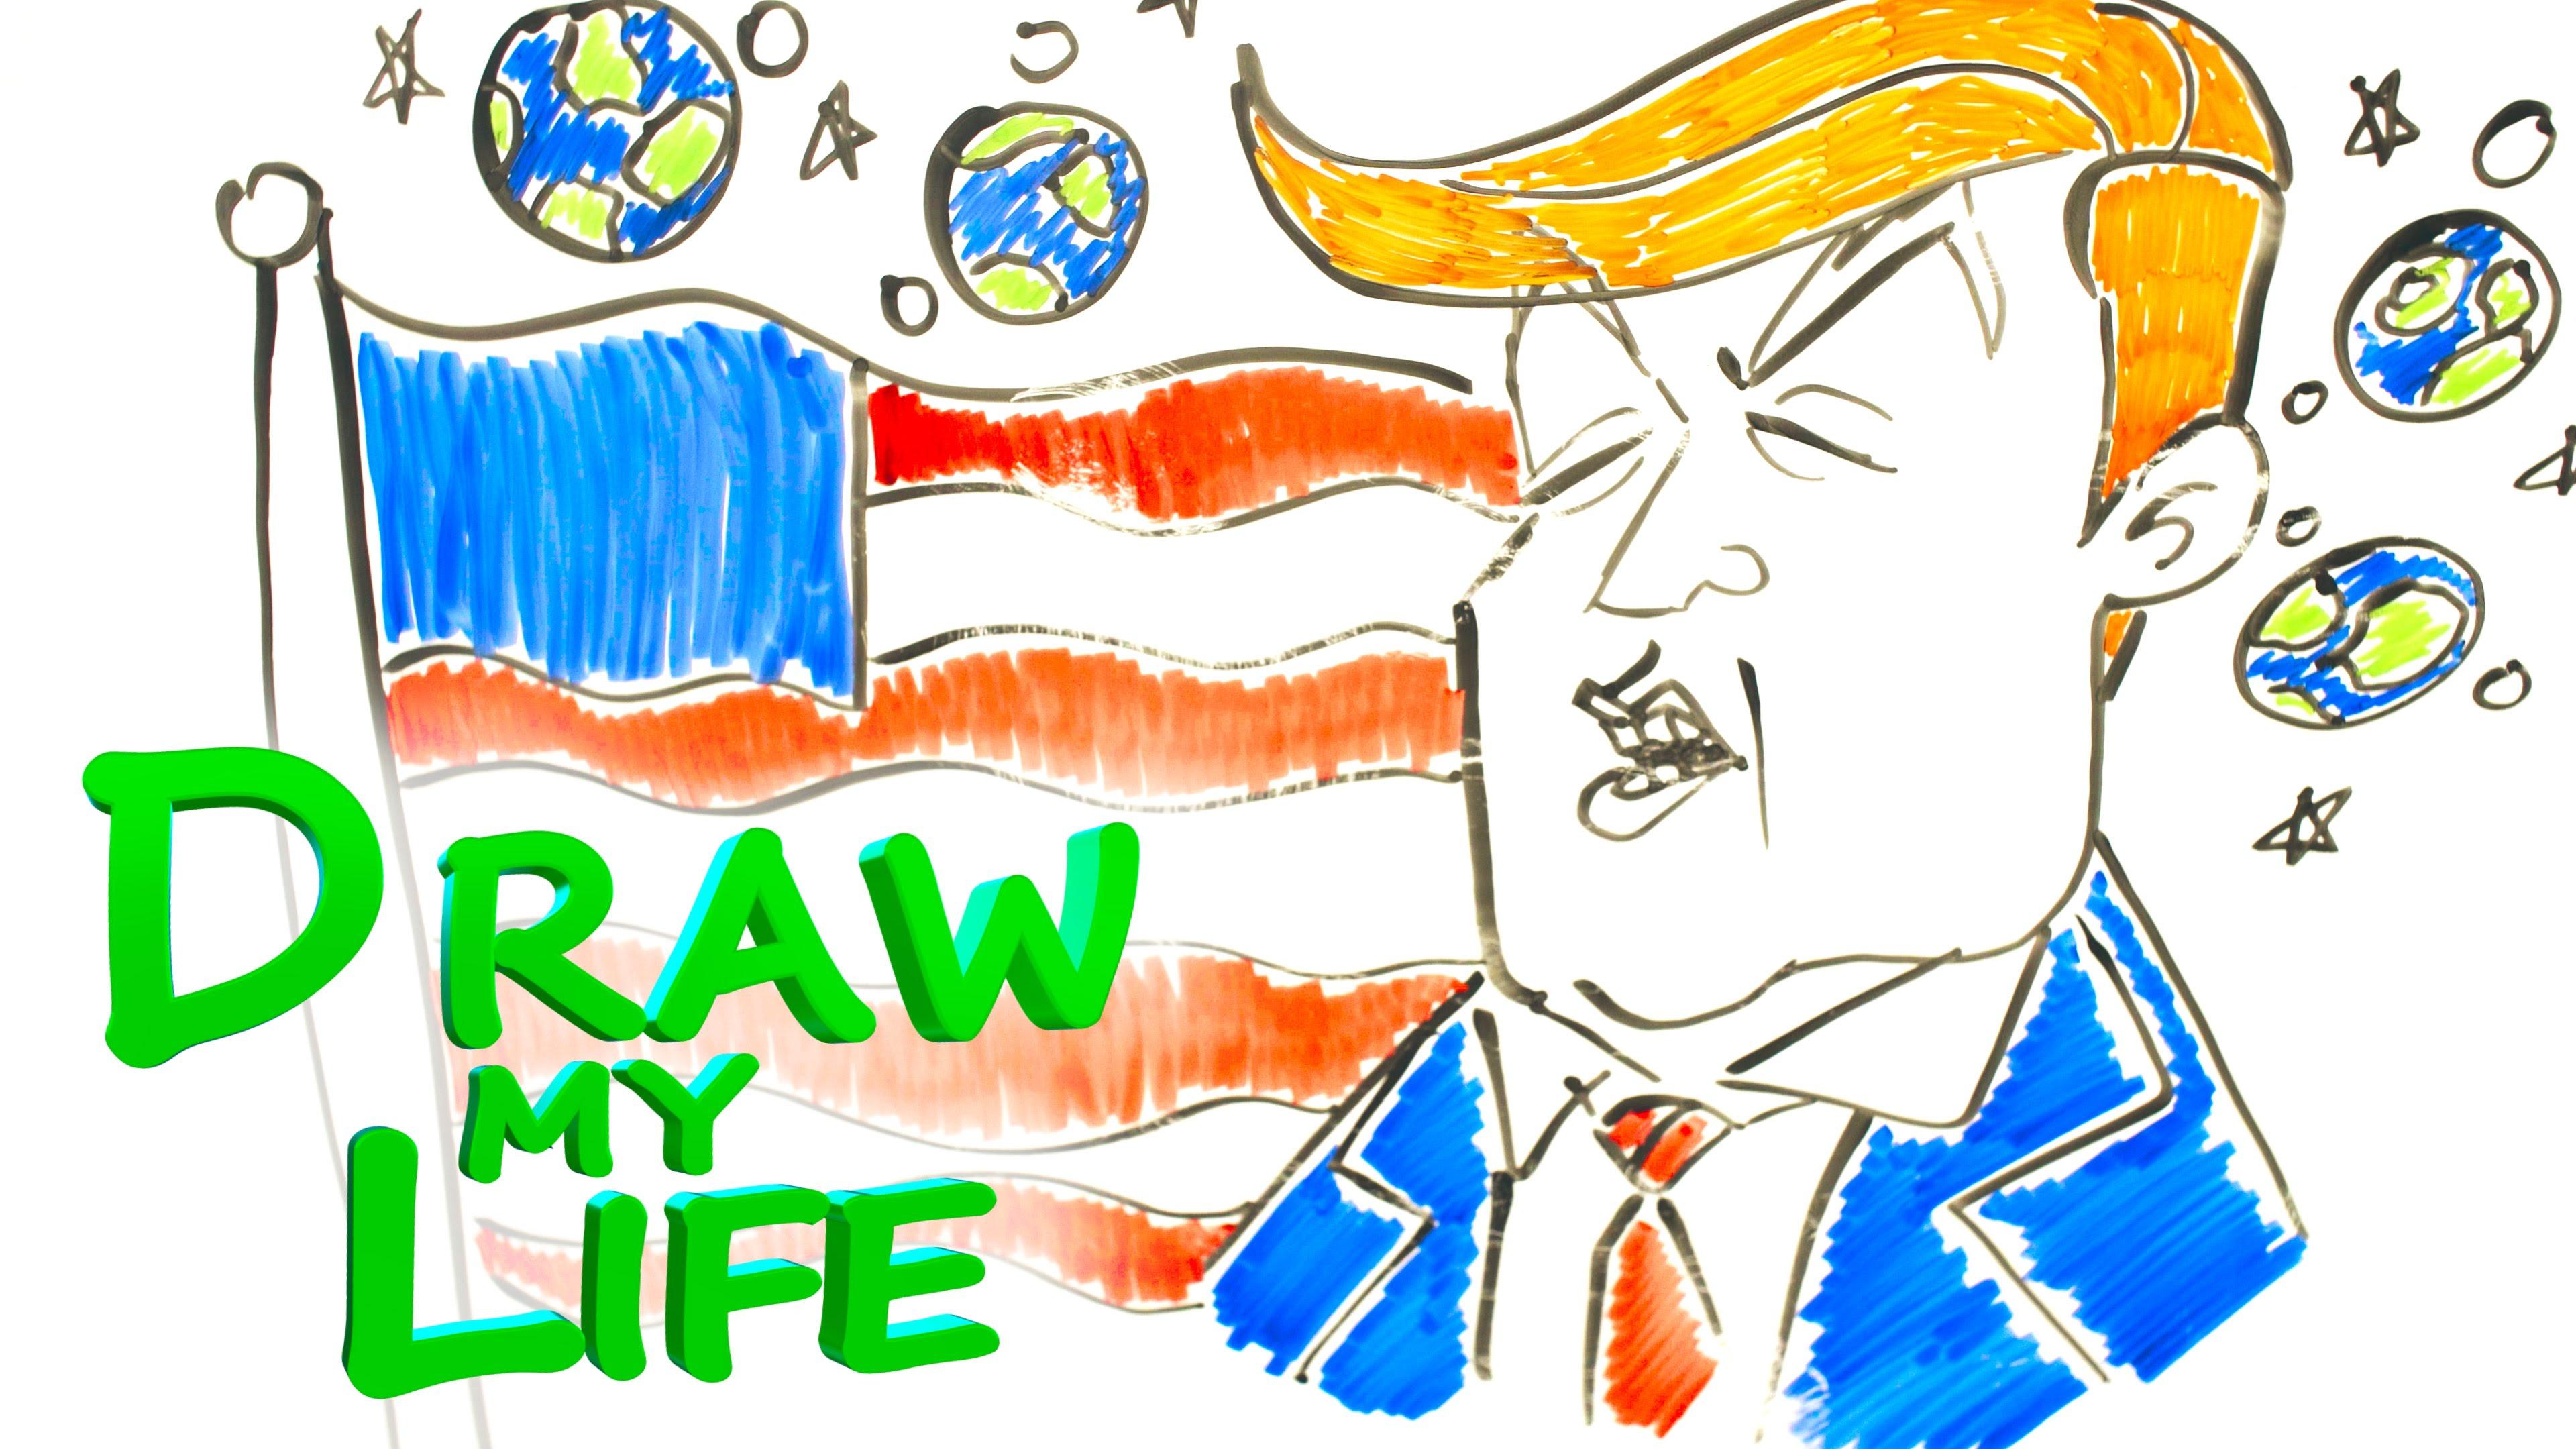 Drawn music line drawing YouTube LIFE MY MY Trump